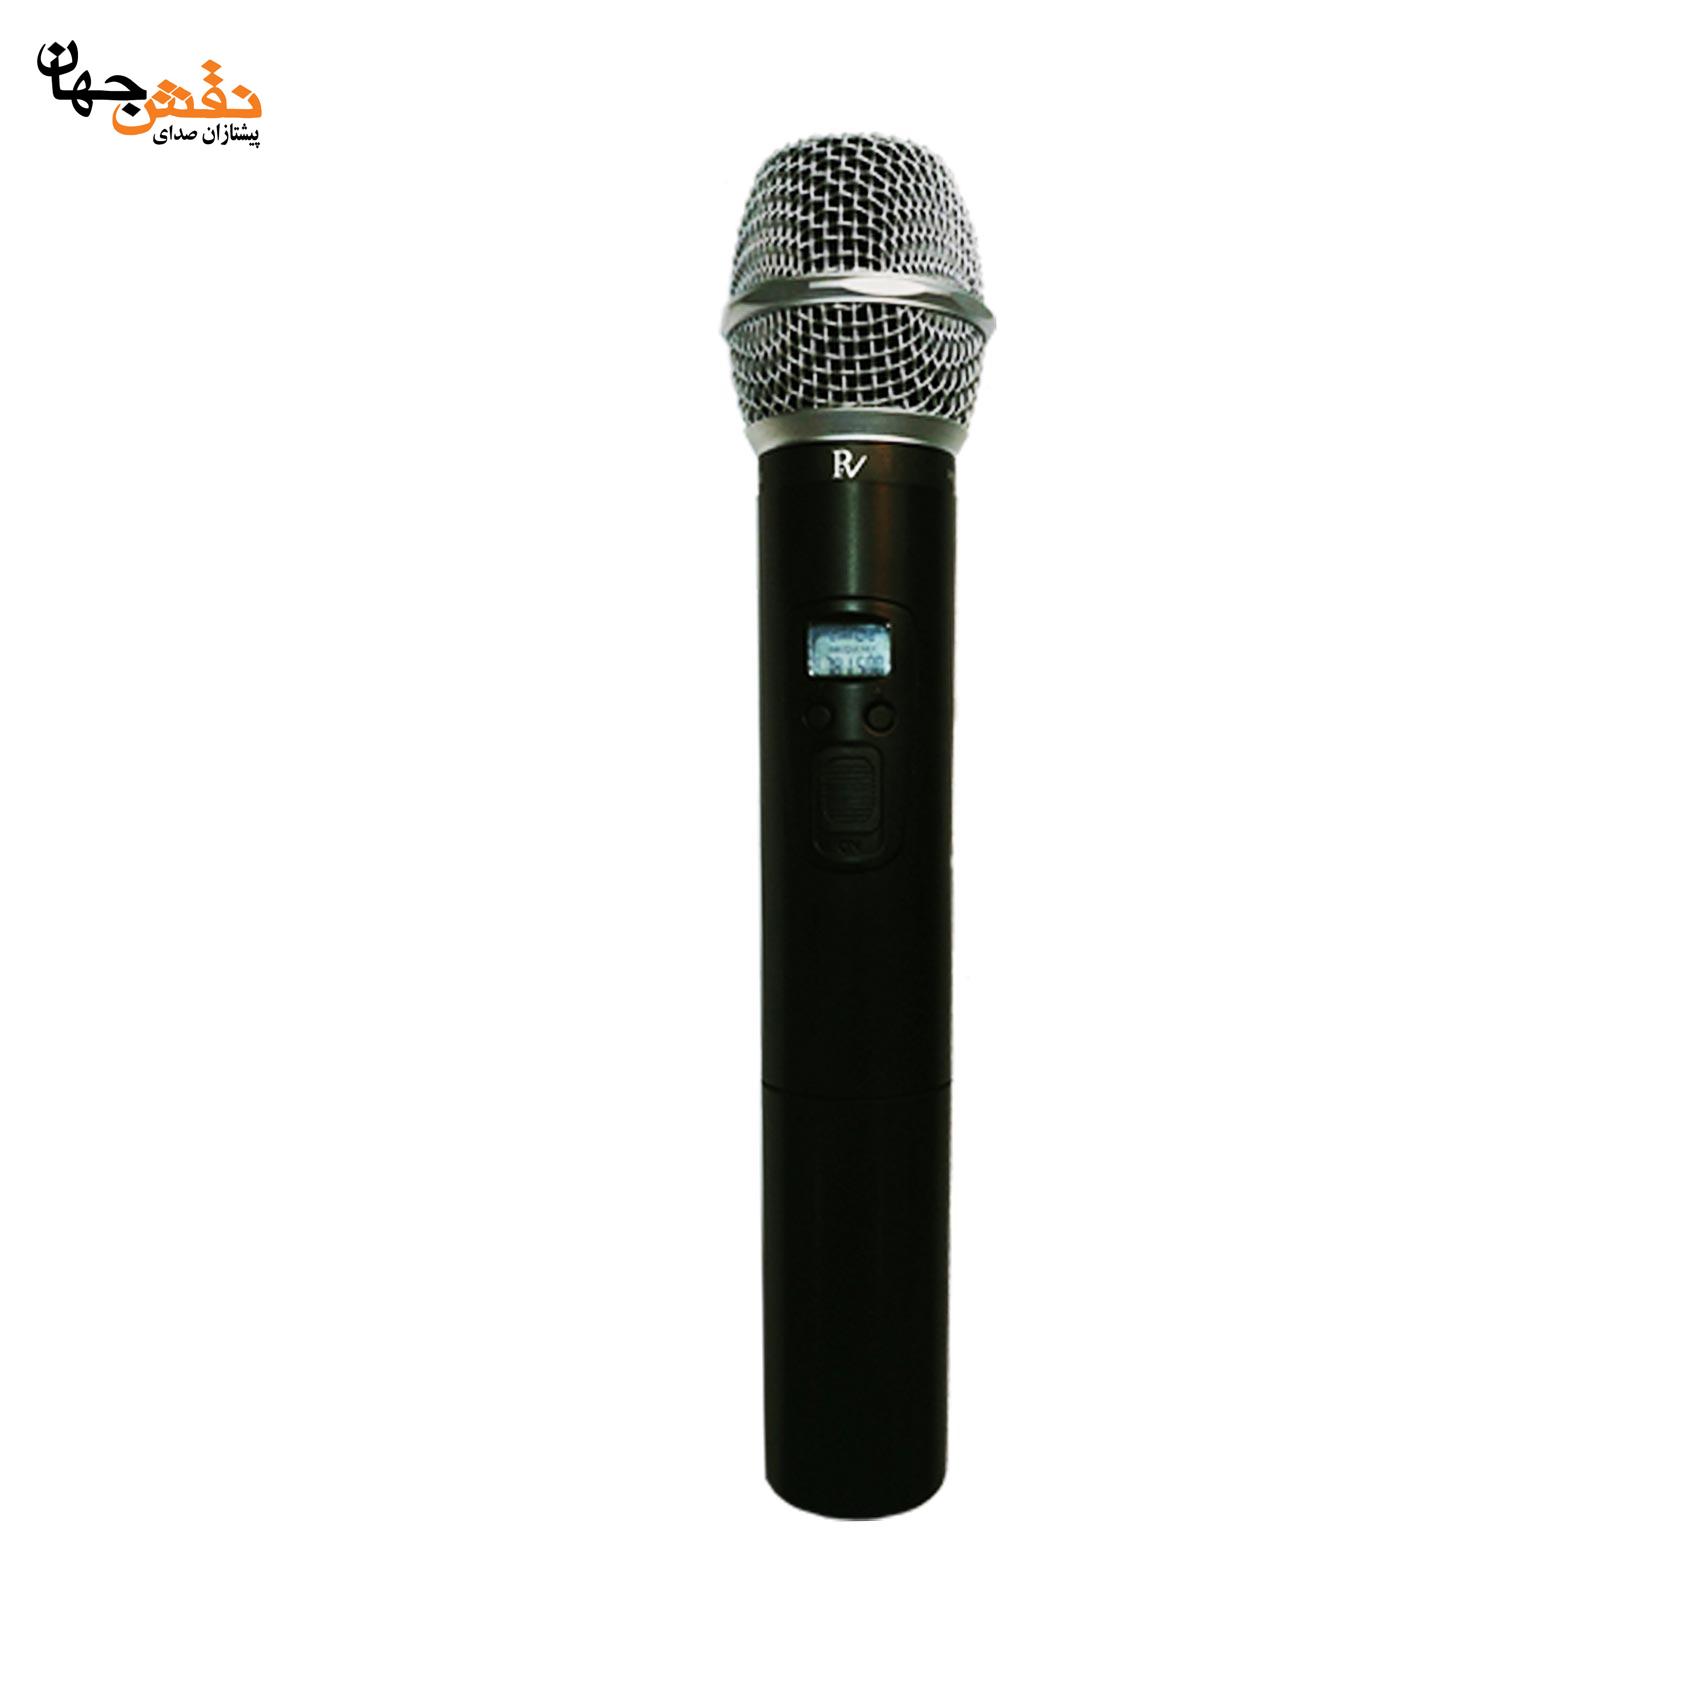 PV-mic